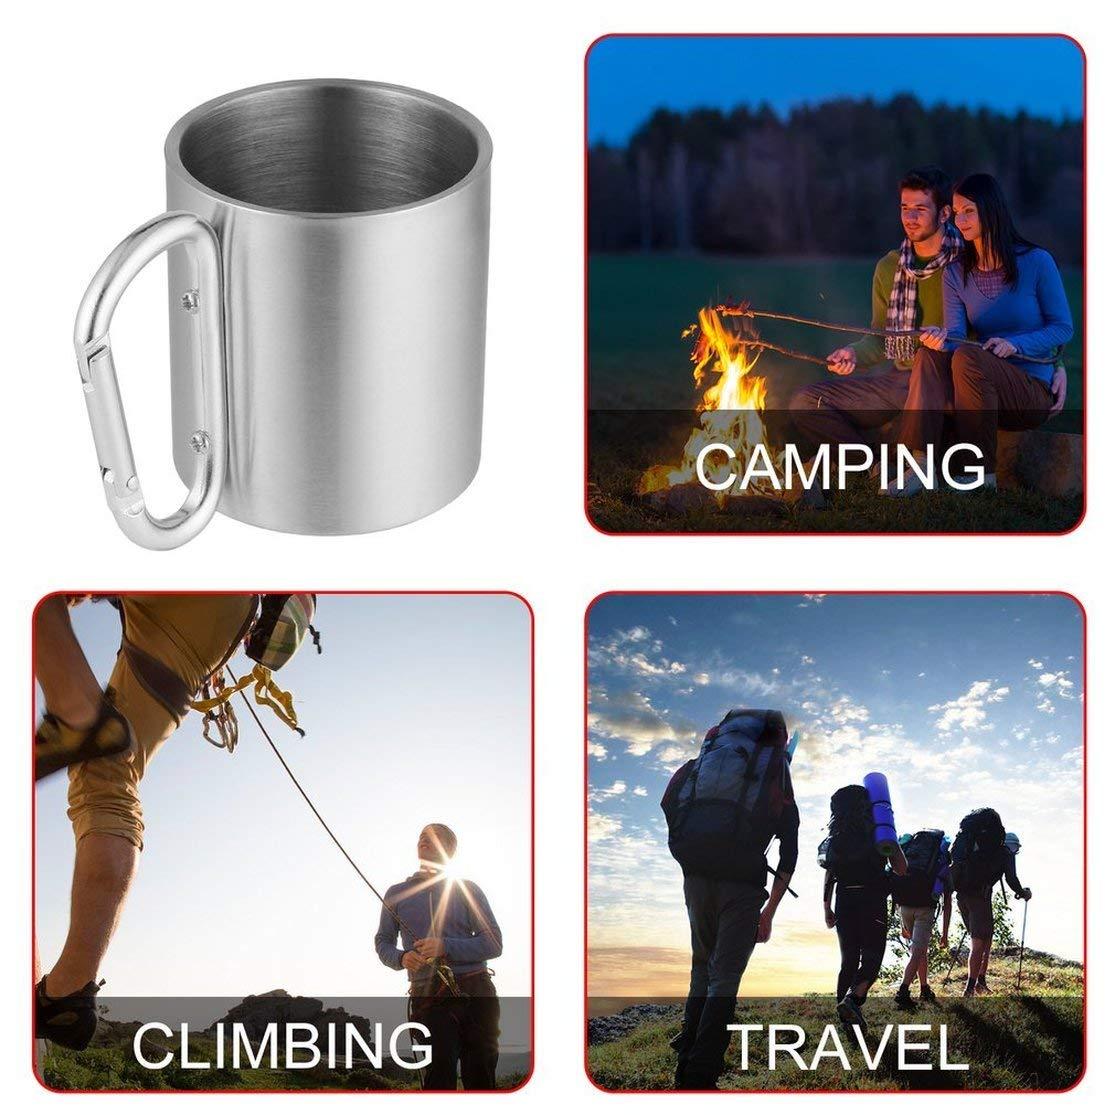 LouiseEvel215 Outdoor Edelstahl Wasser Tee Kaffeetasse Self Lock Karabiner Griff Tasse F/ür Camping Wandern Klettern Tragbare